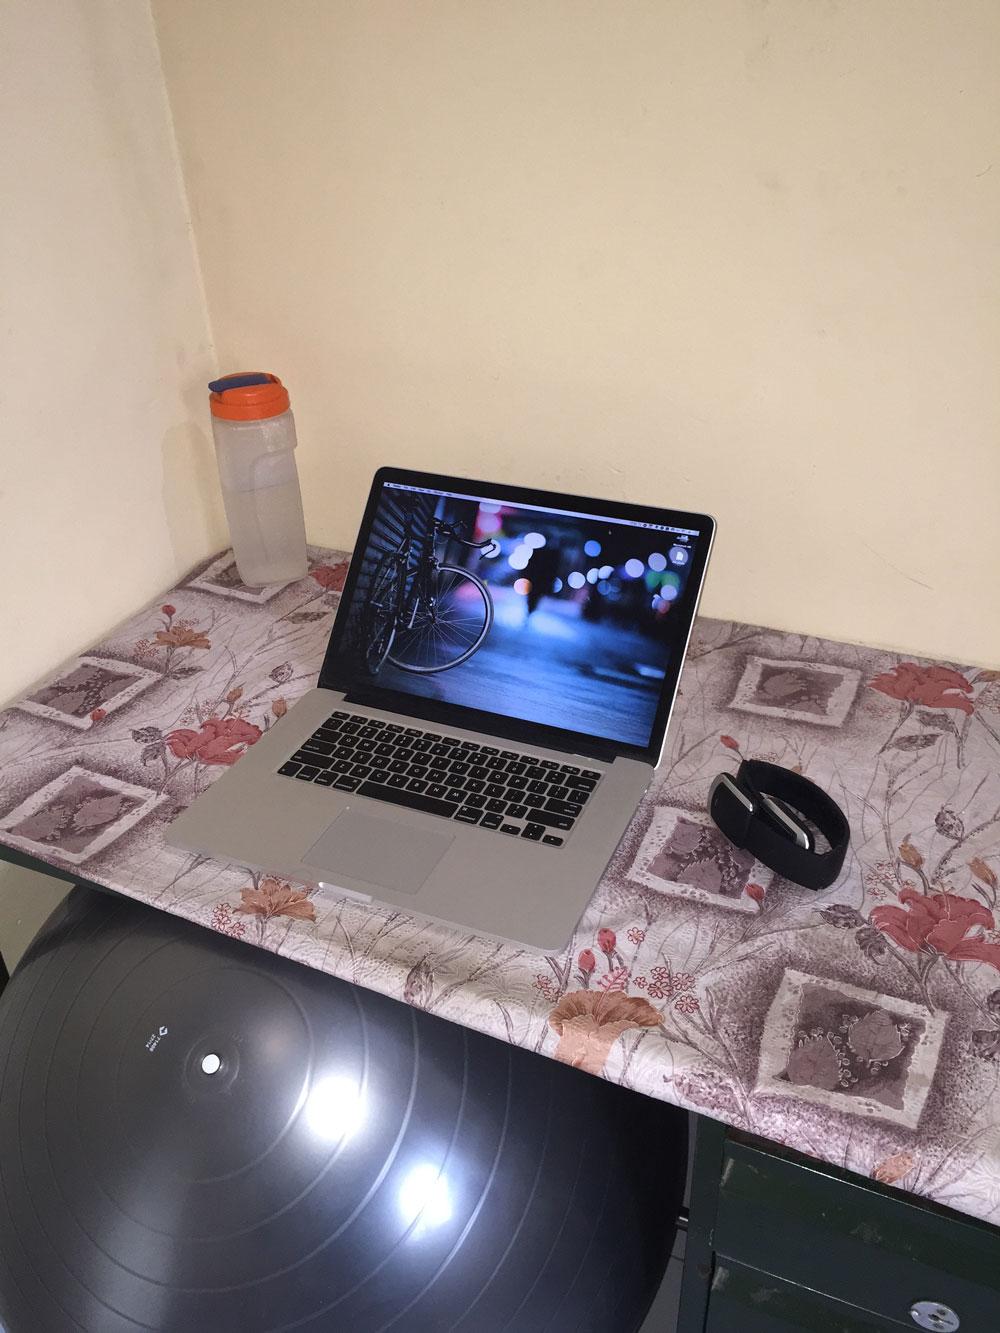 Saravanan Sivaraman's desk